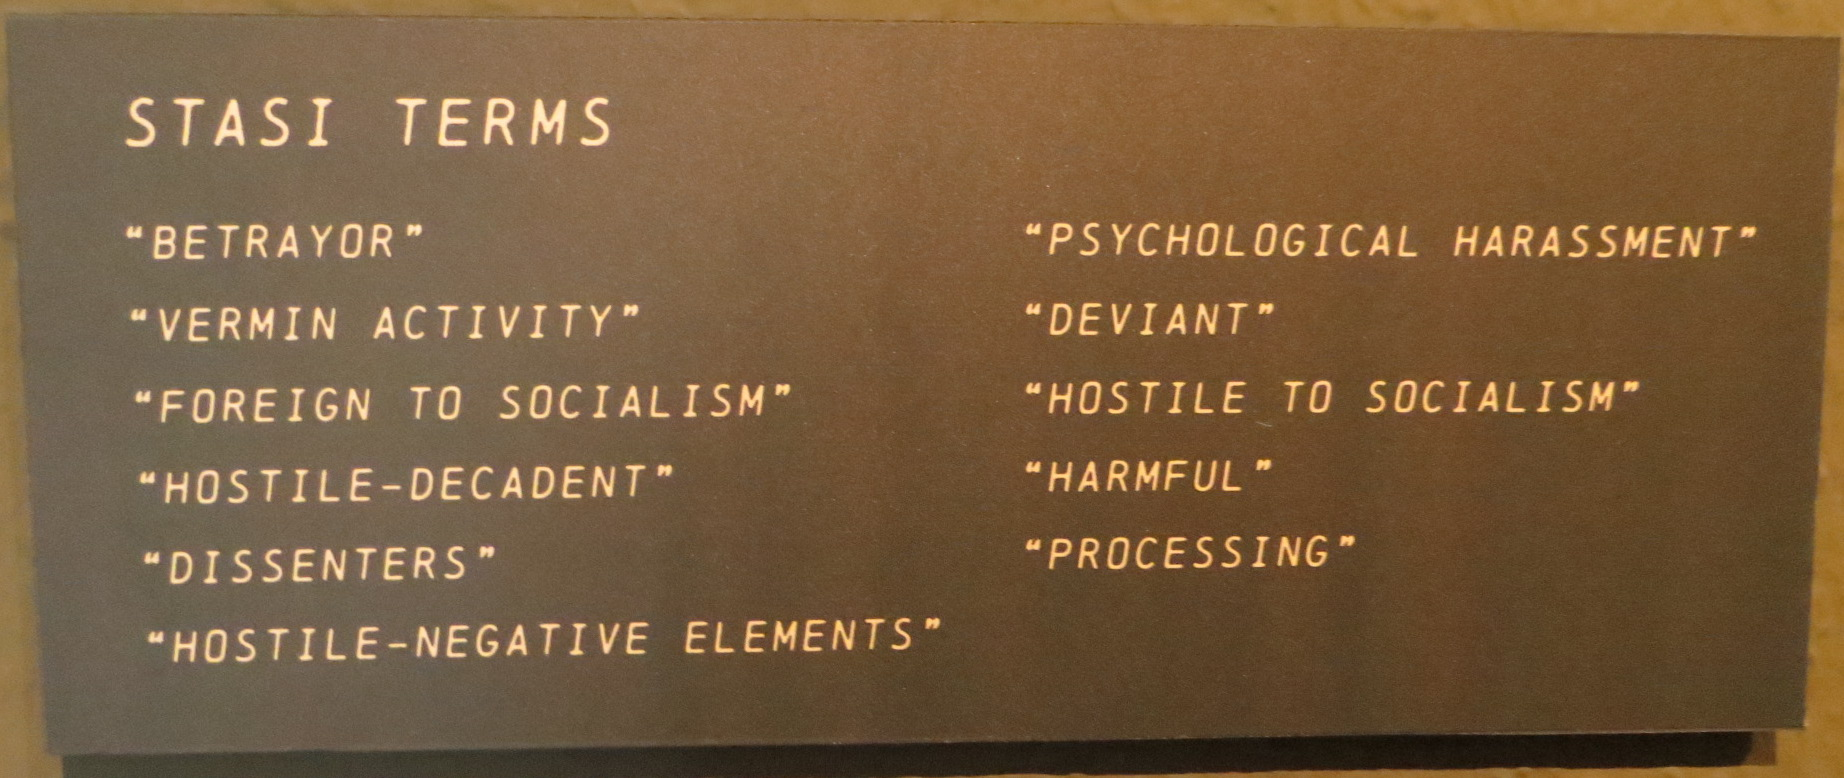 Stasi terms